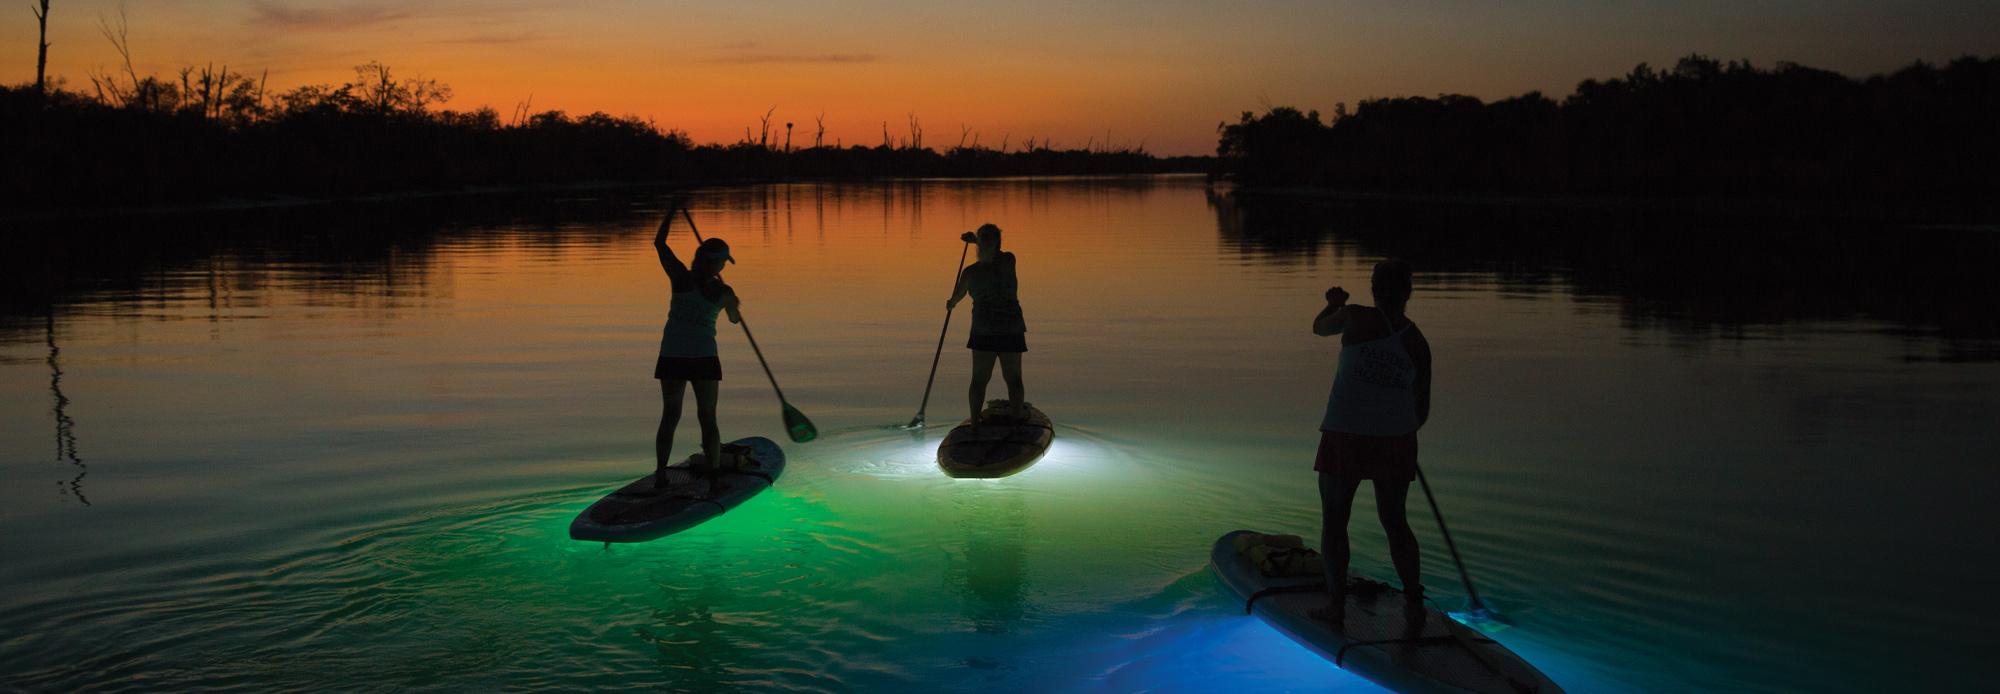 nighttime stand up paddleboard